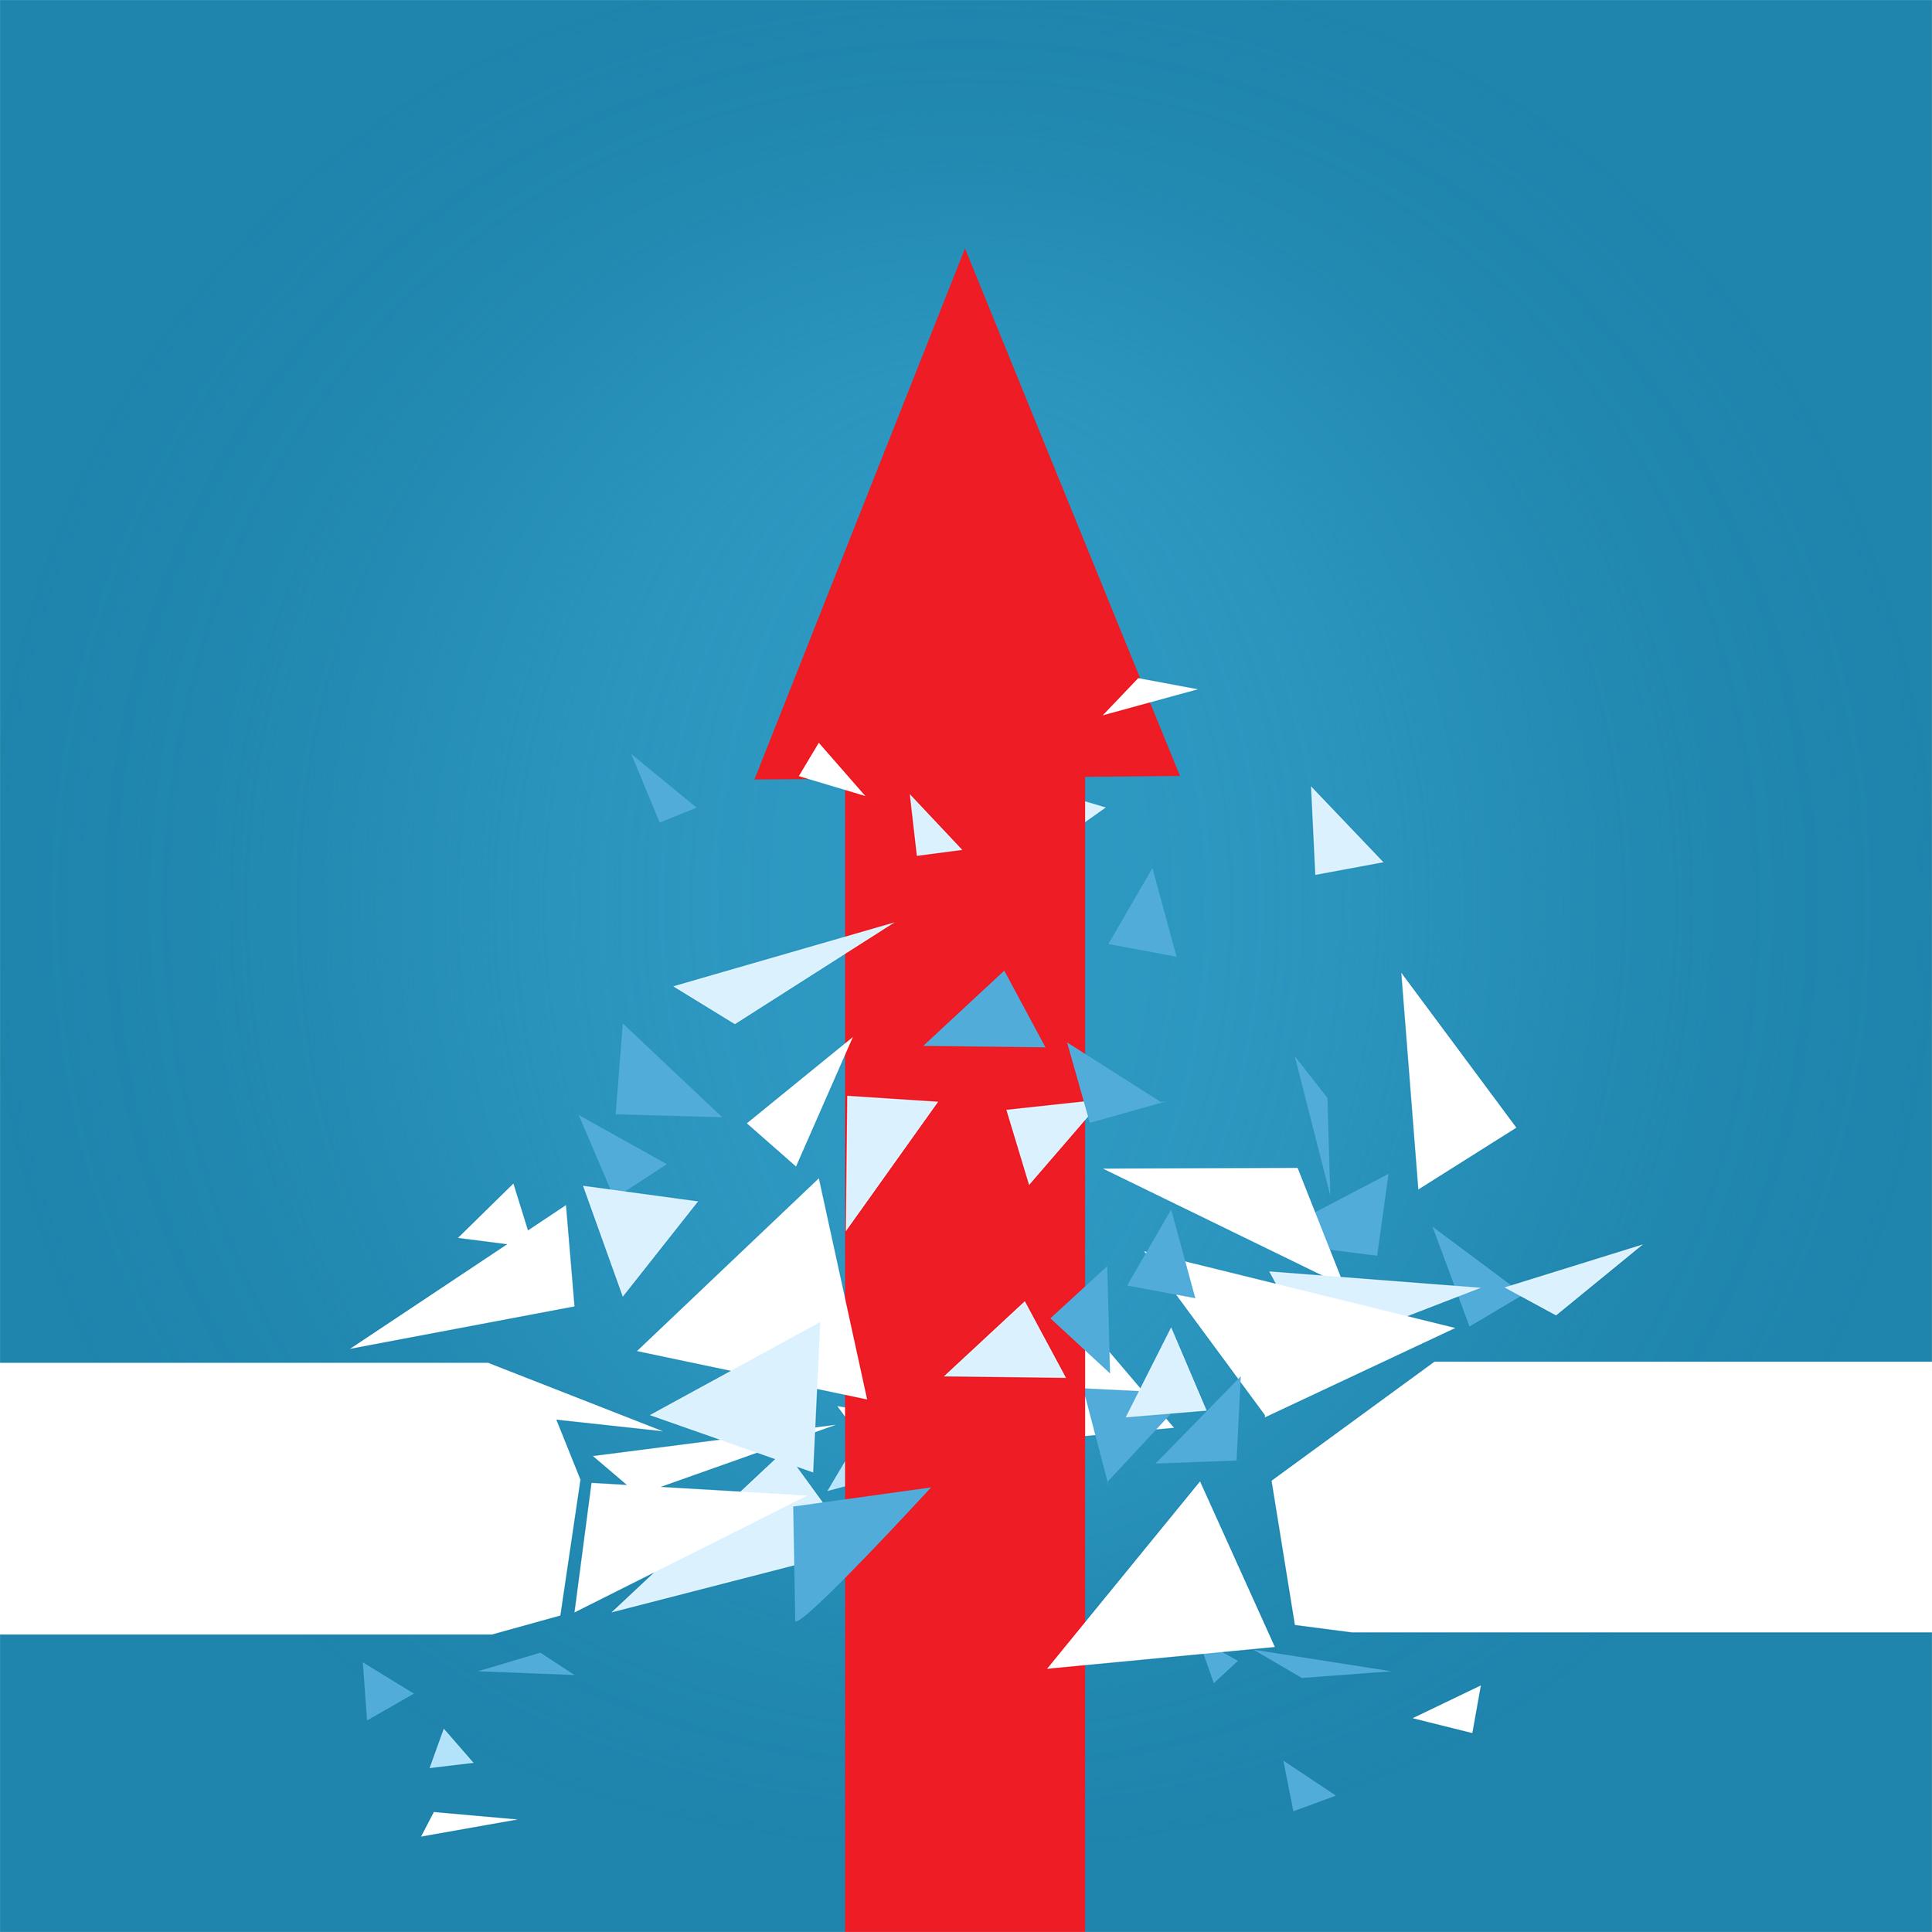 Red arrow blasting through barrier photo